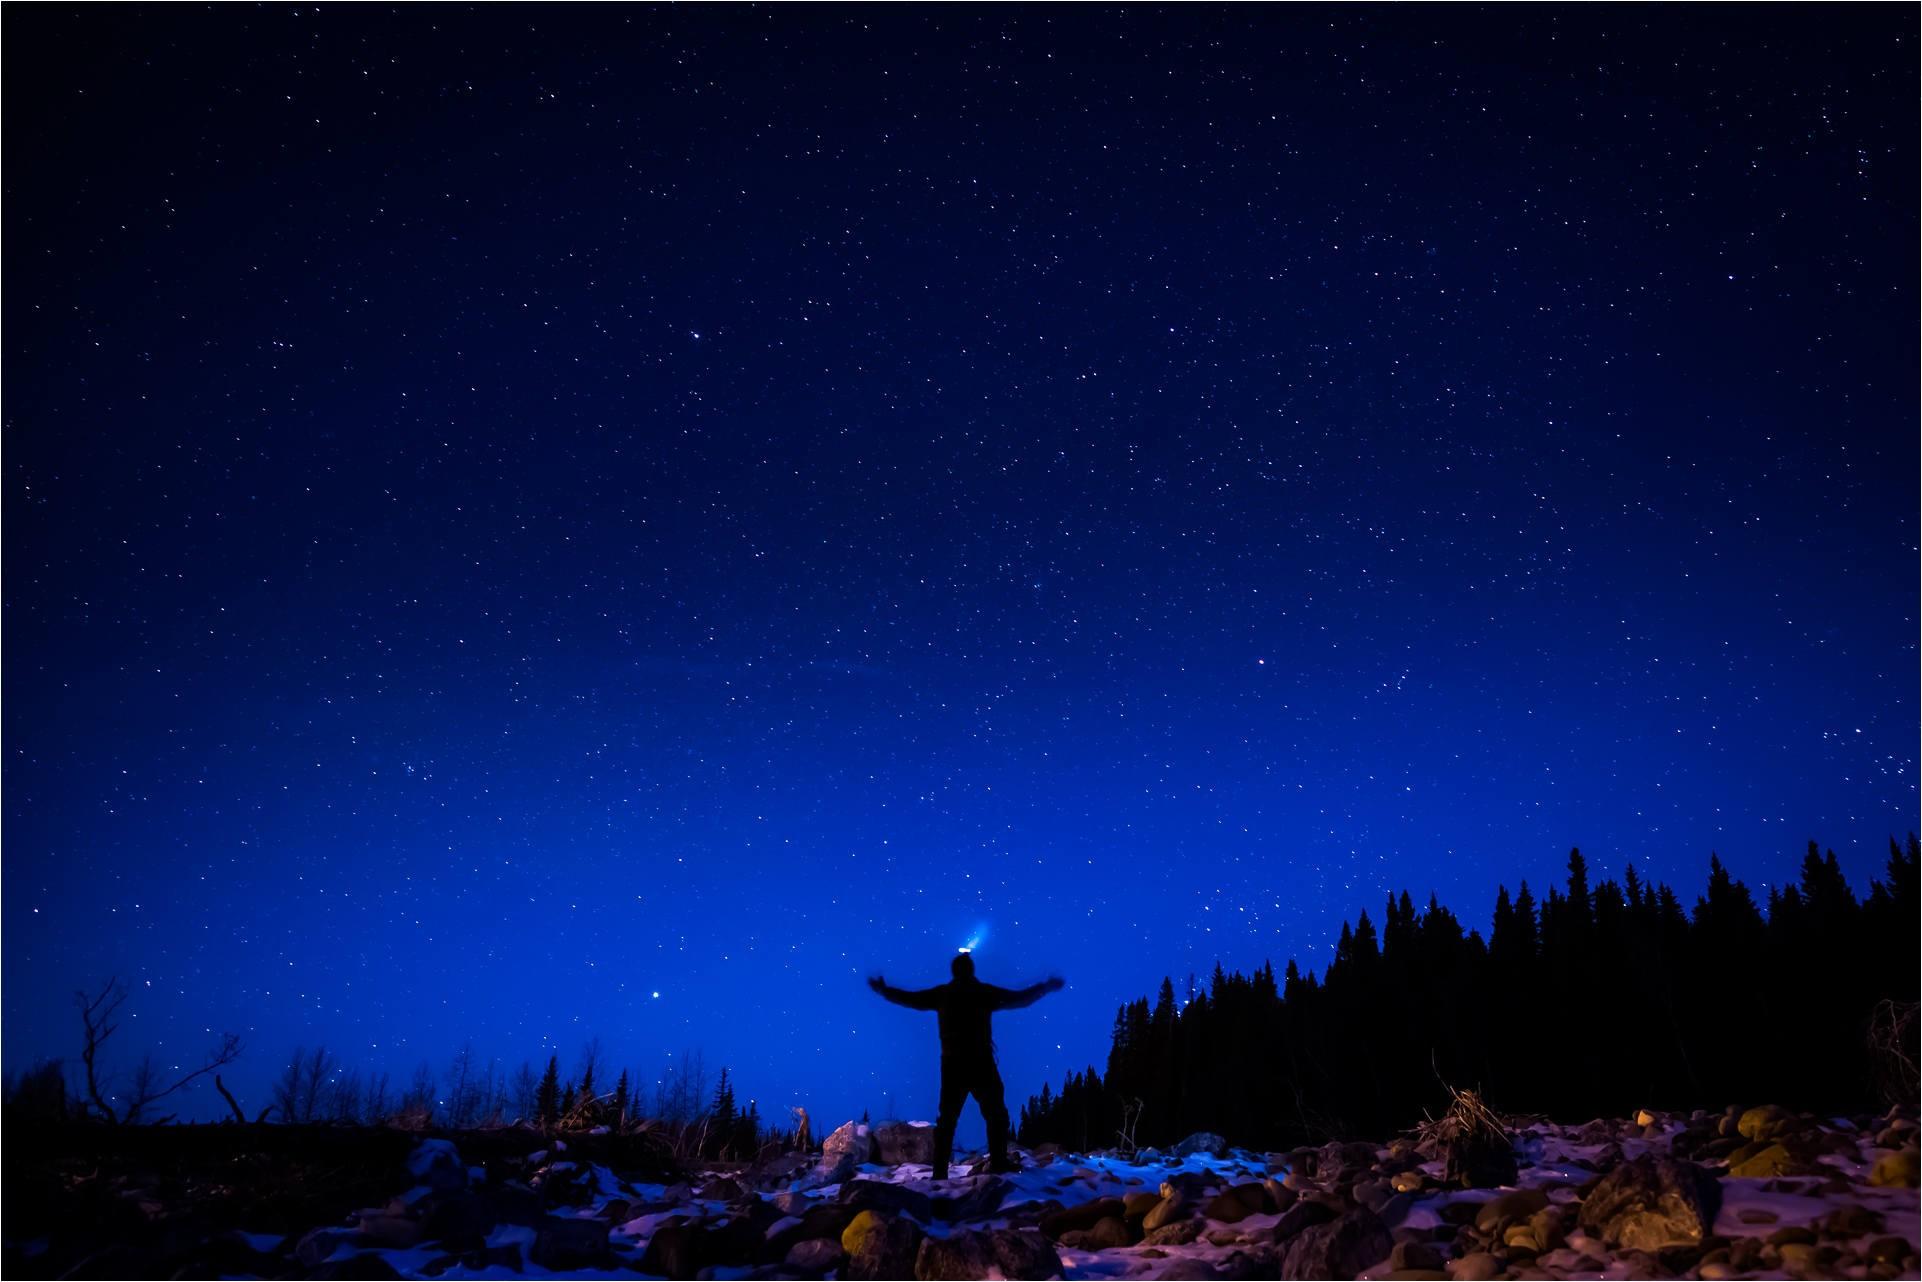 sky full of stars | Christopher Martin Photography